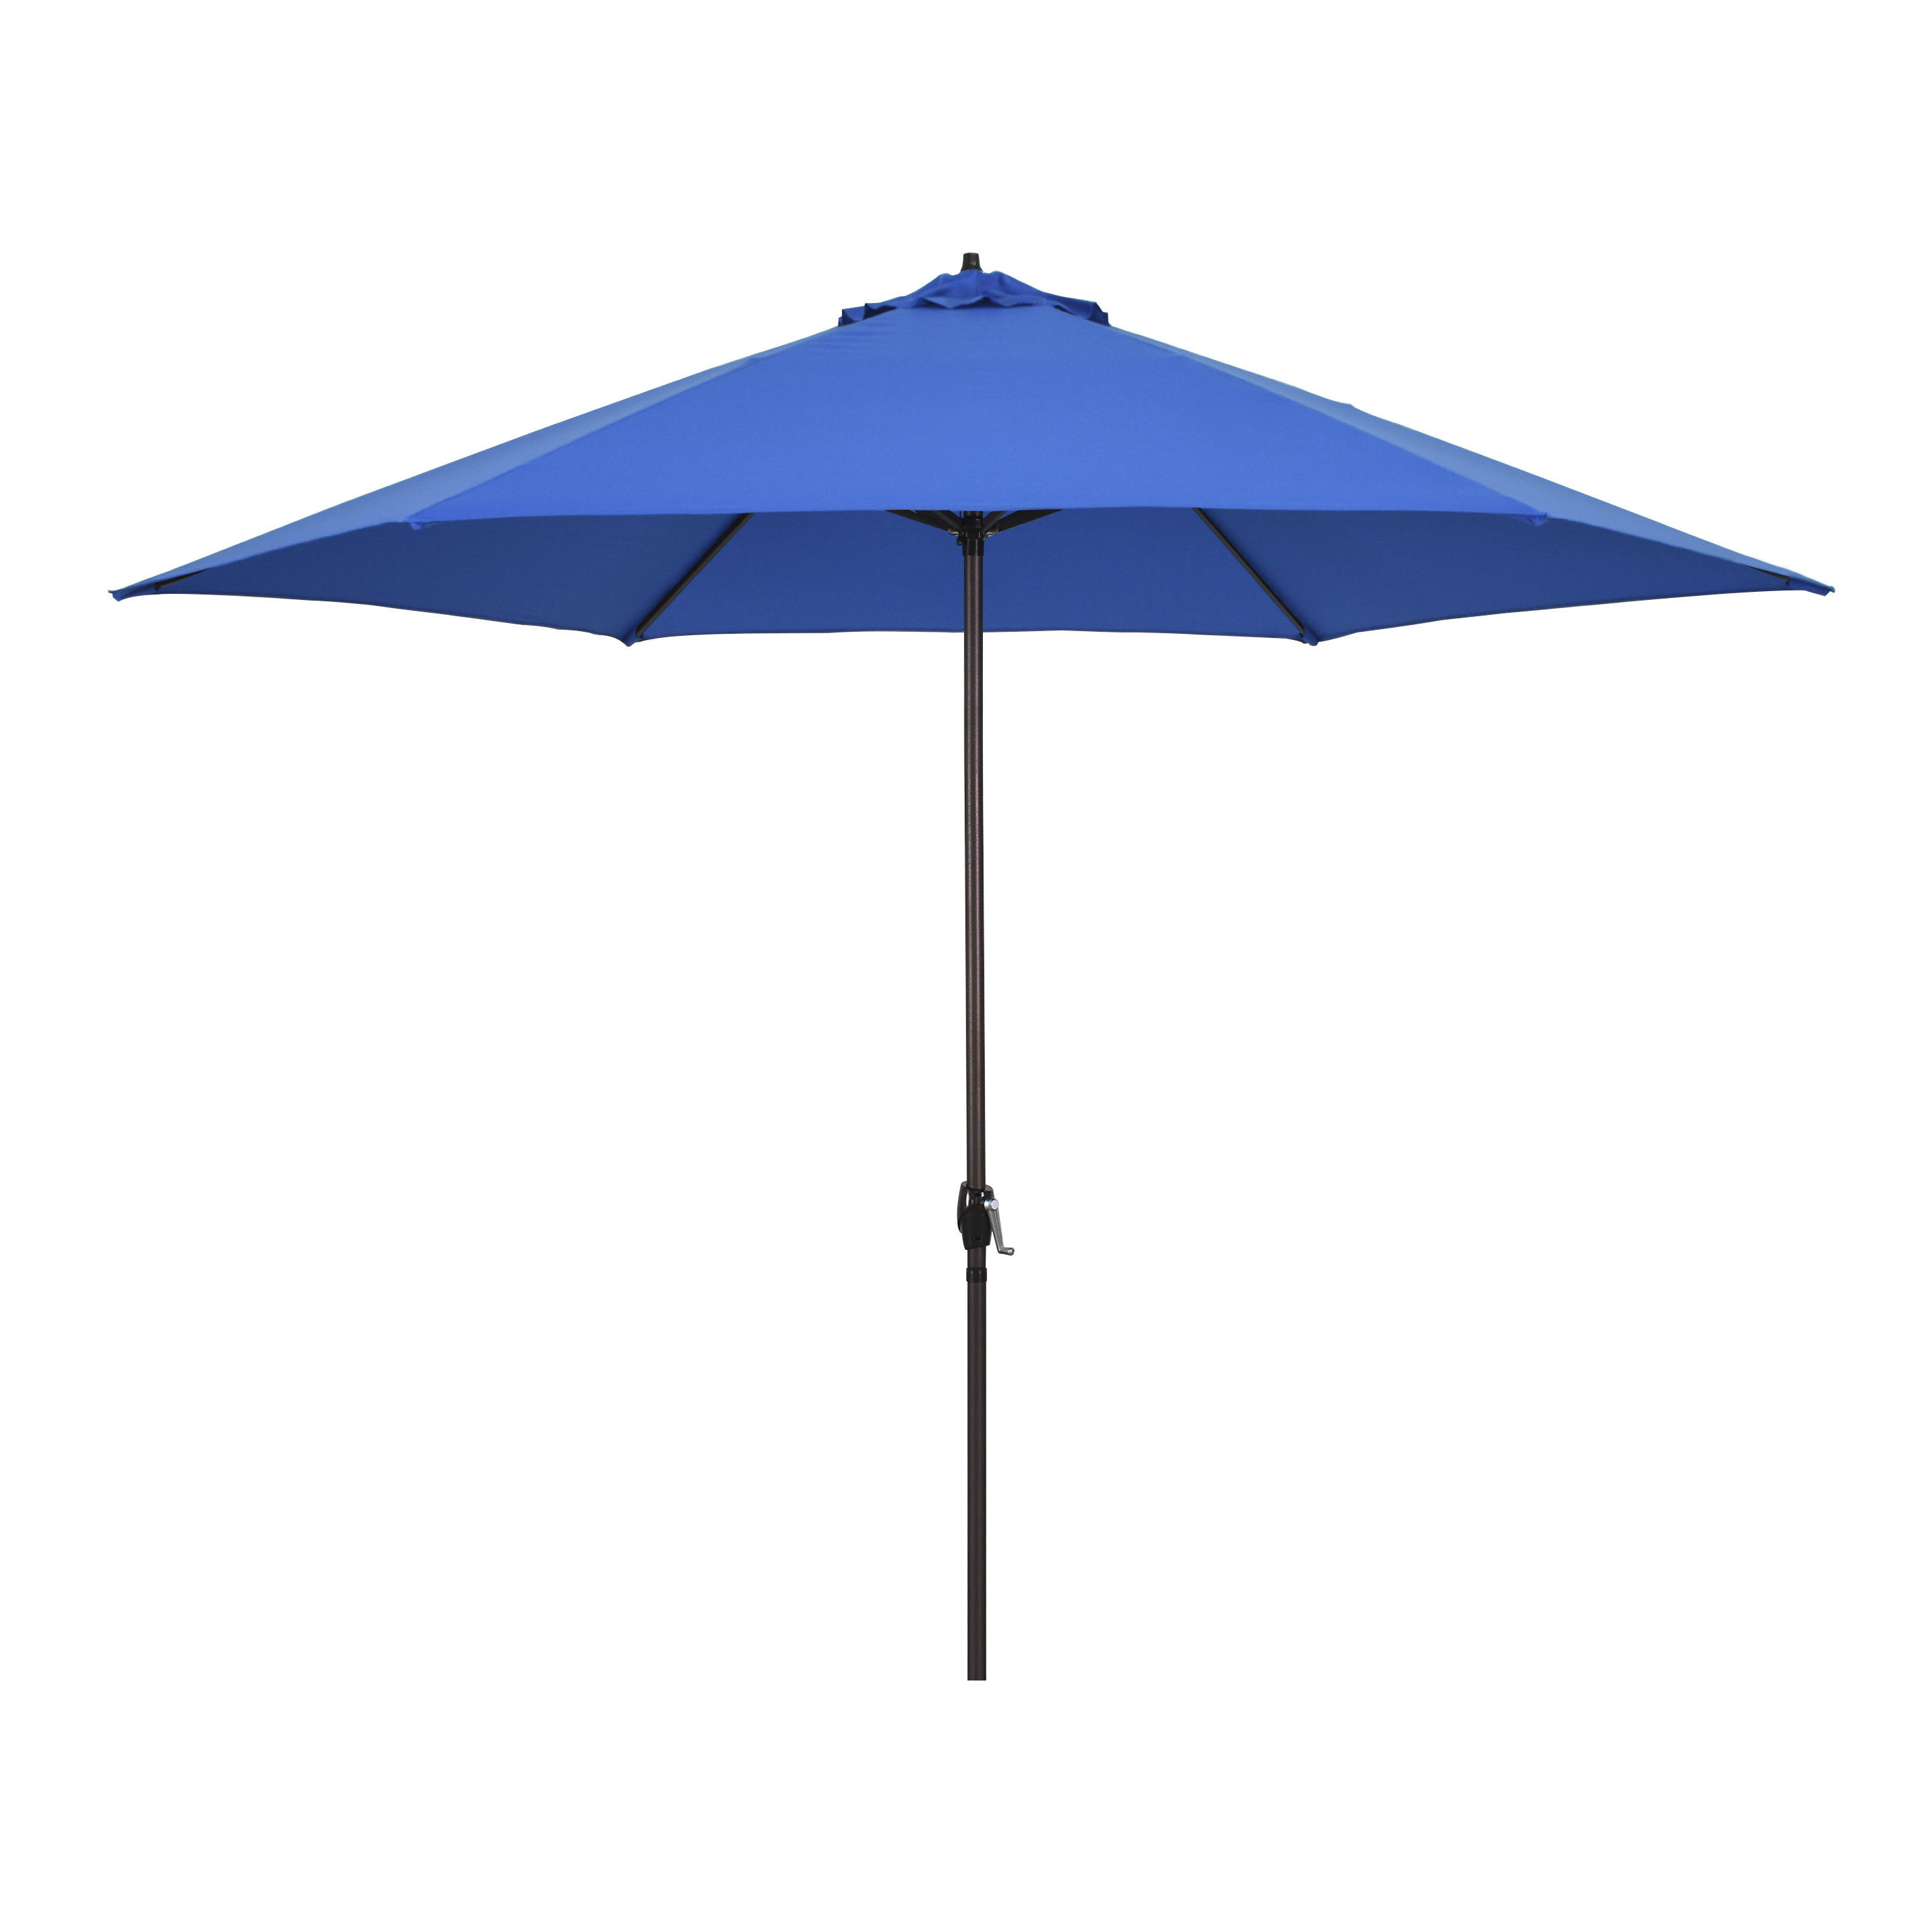 Mraz Market Umbrellas Regarding Well Known Mcdougal 11' Market Umbrella (View 11 of 20)